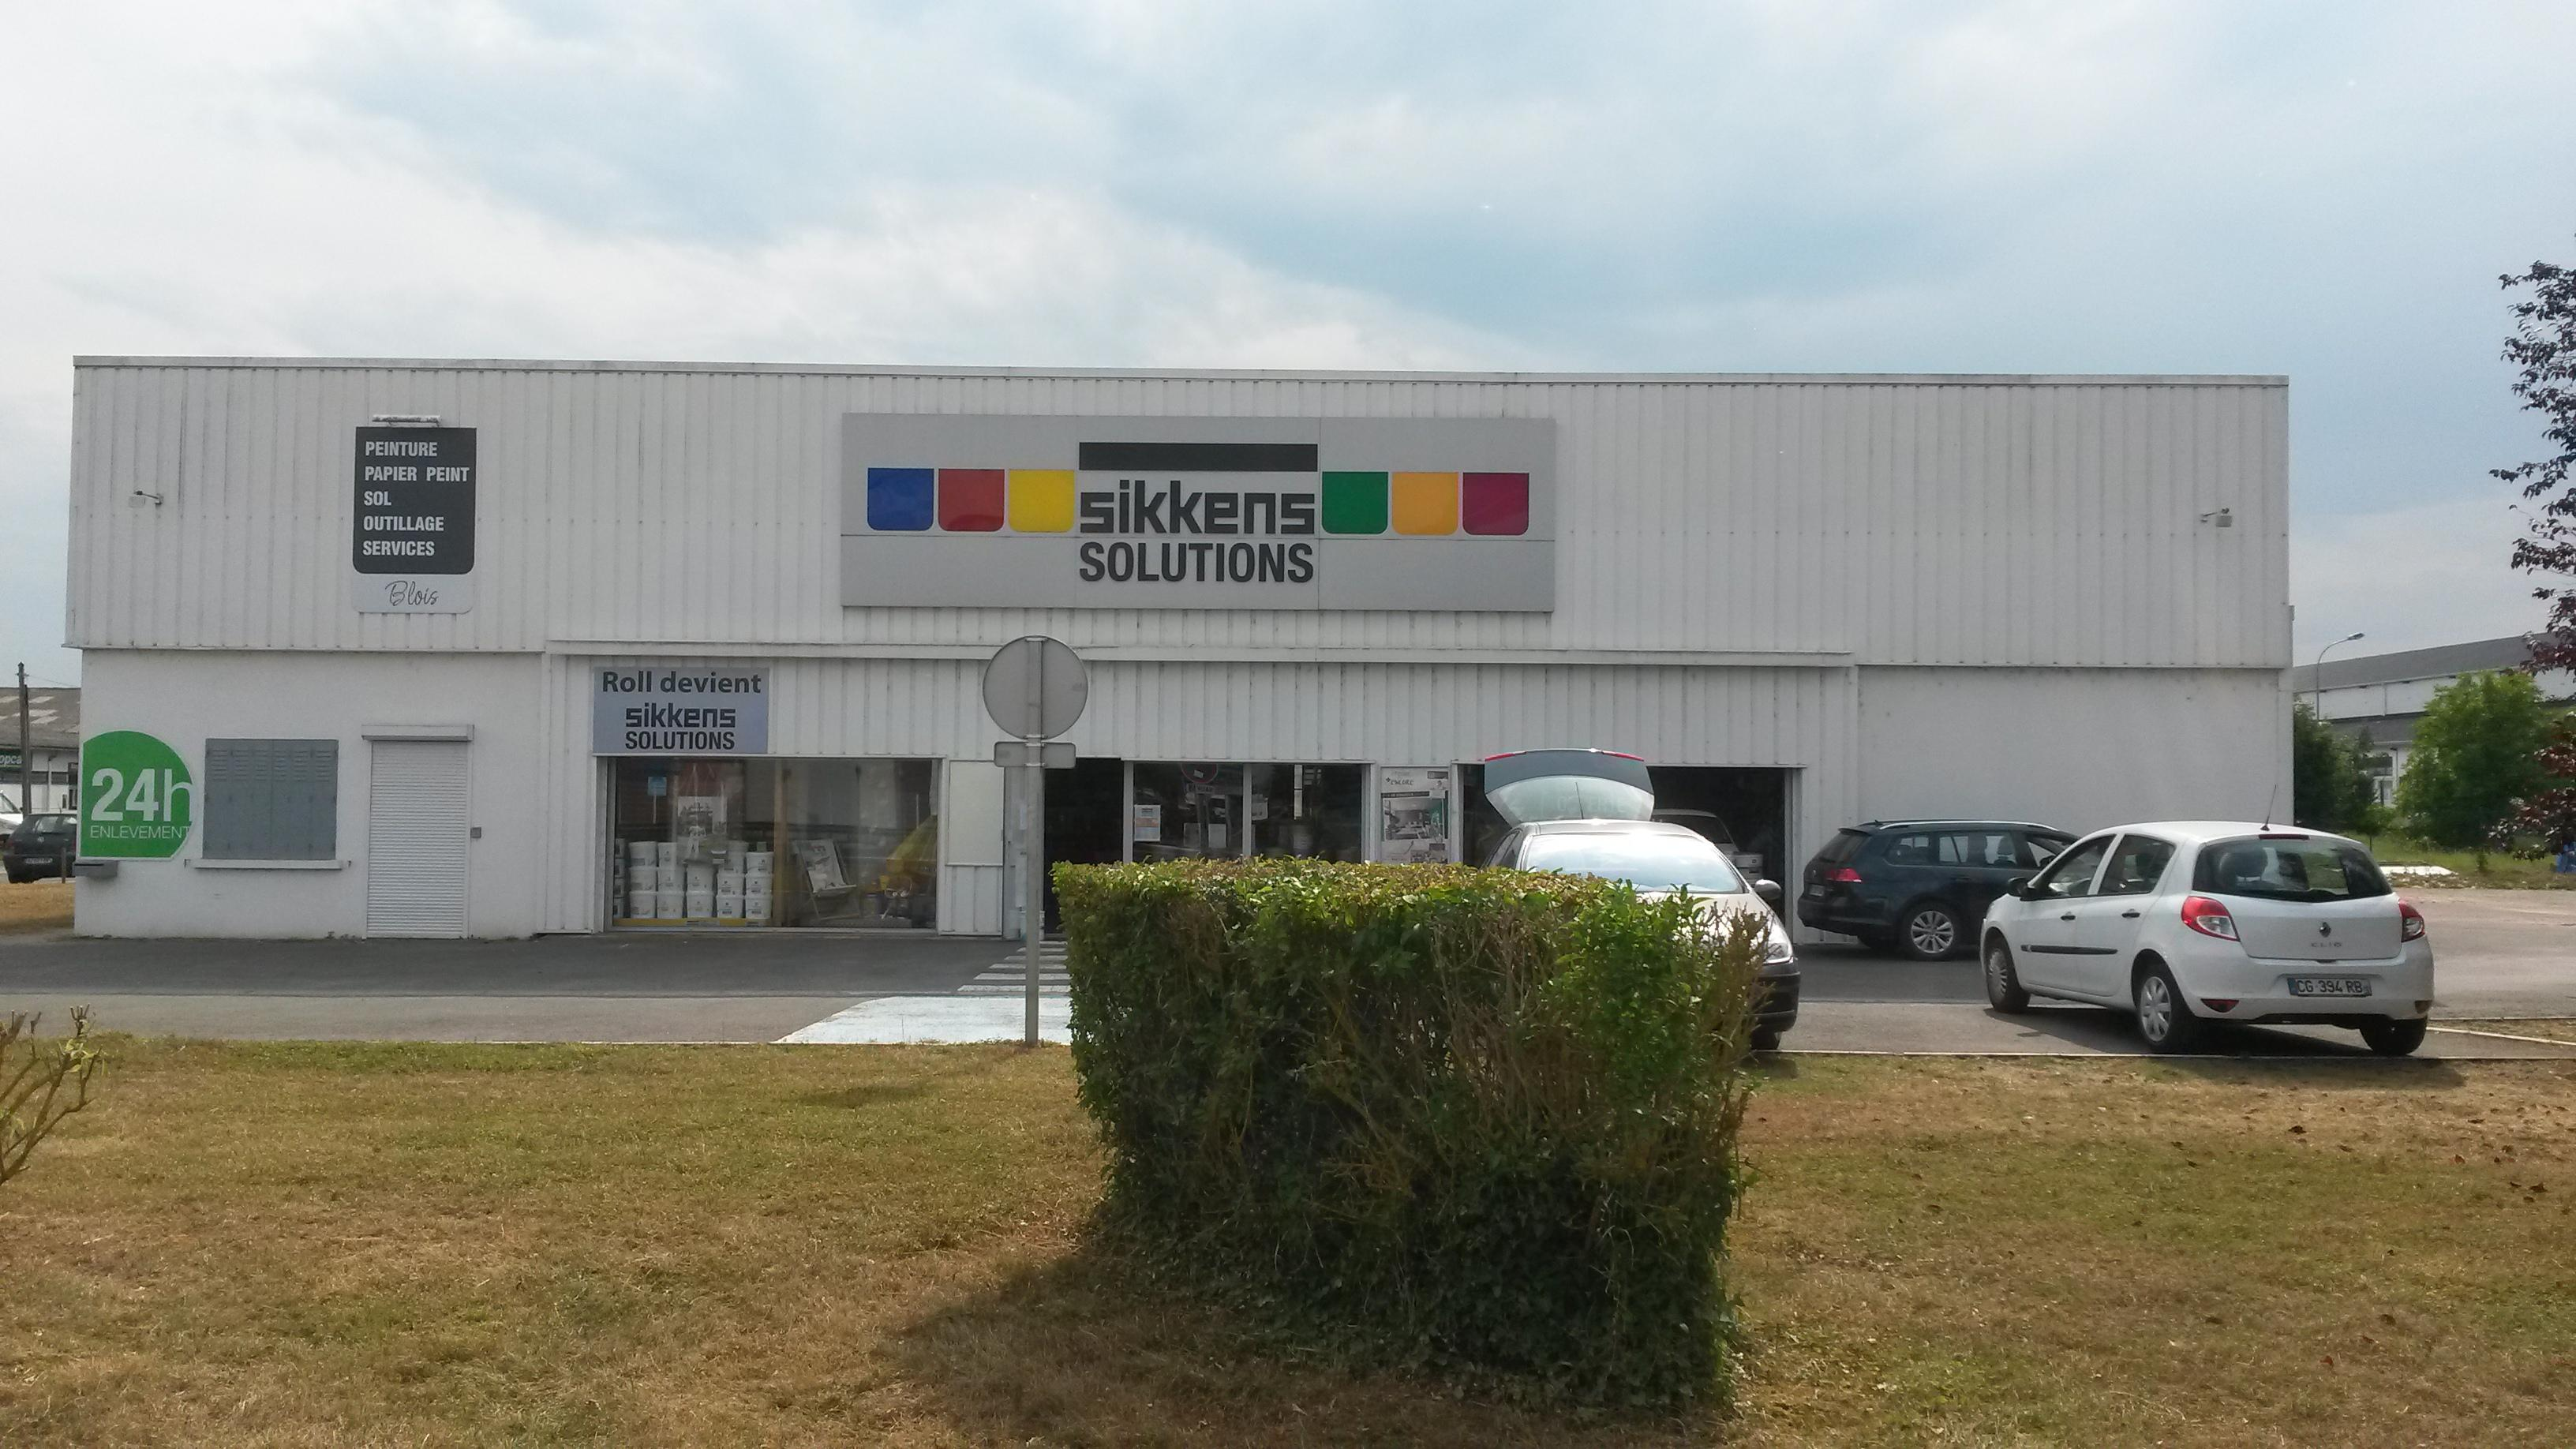 Sikkens Solutions Blois